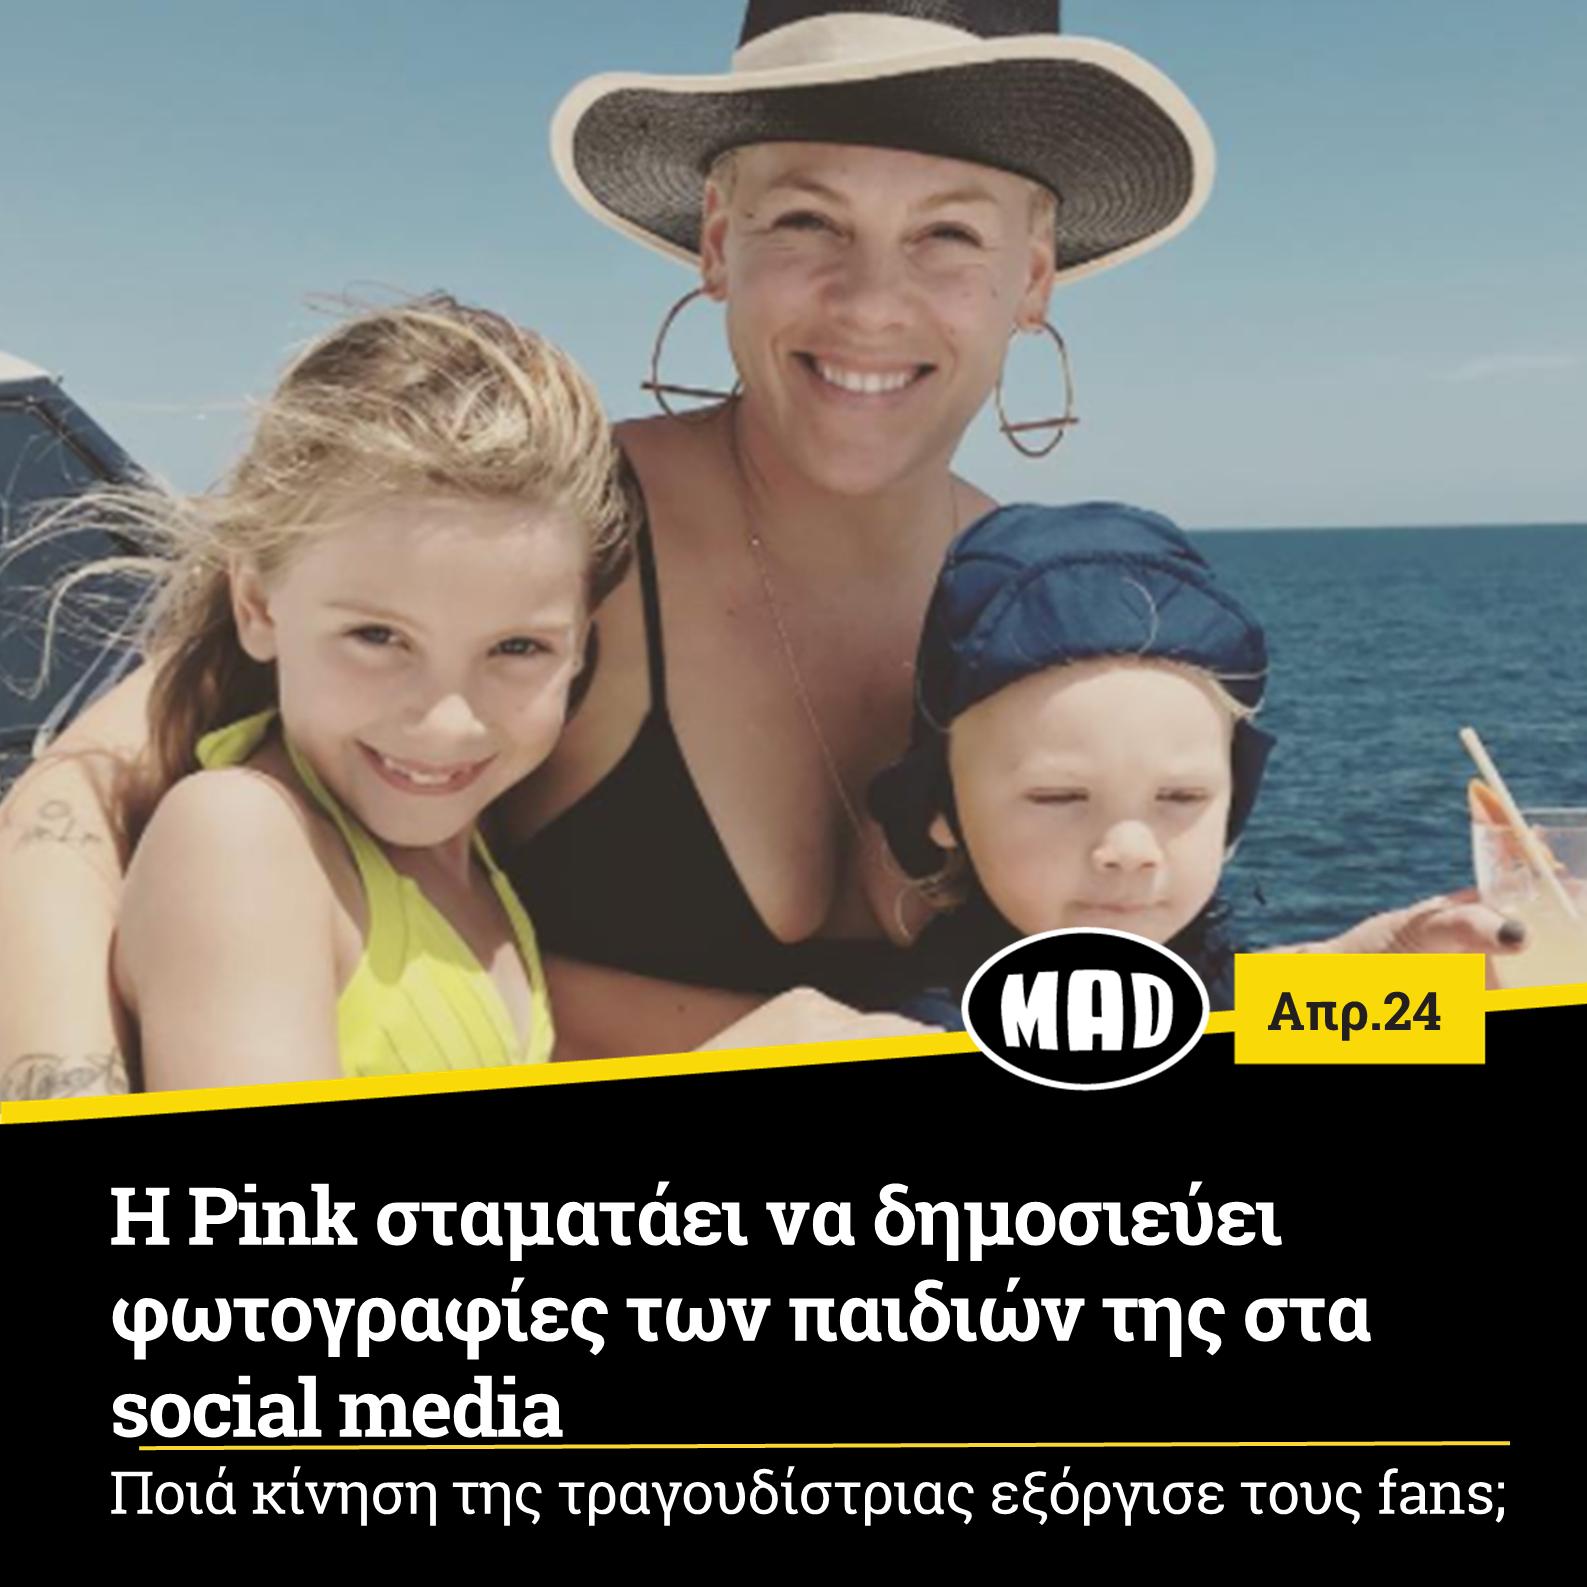 H Pink σταματάει να δημοσιεύει φωτογραφίες των παιδιών της στα social media